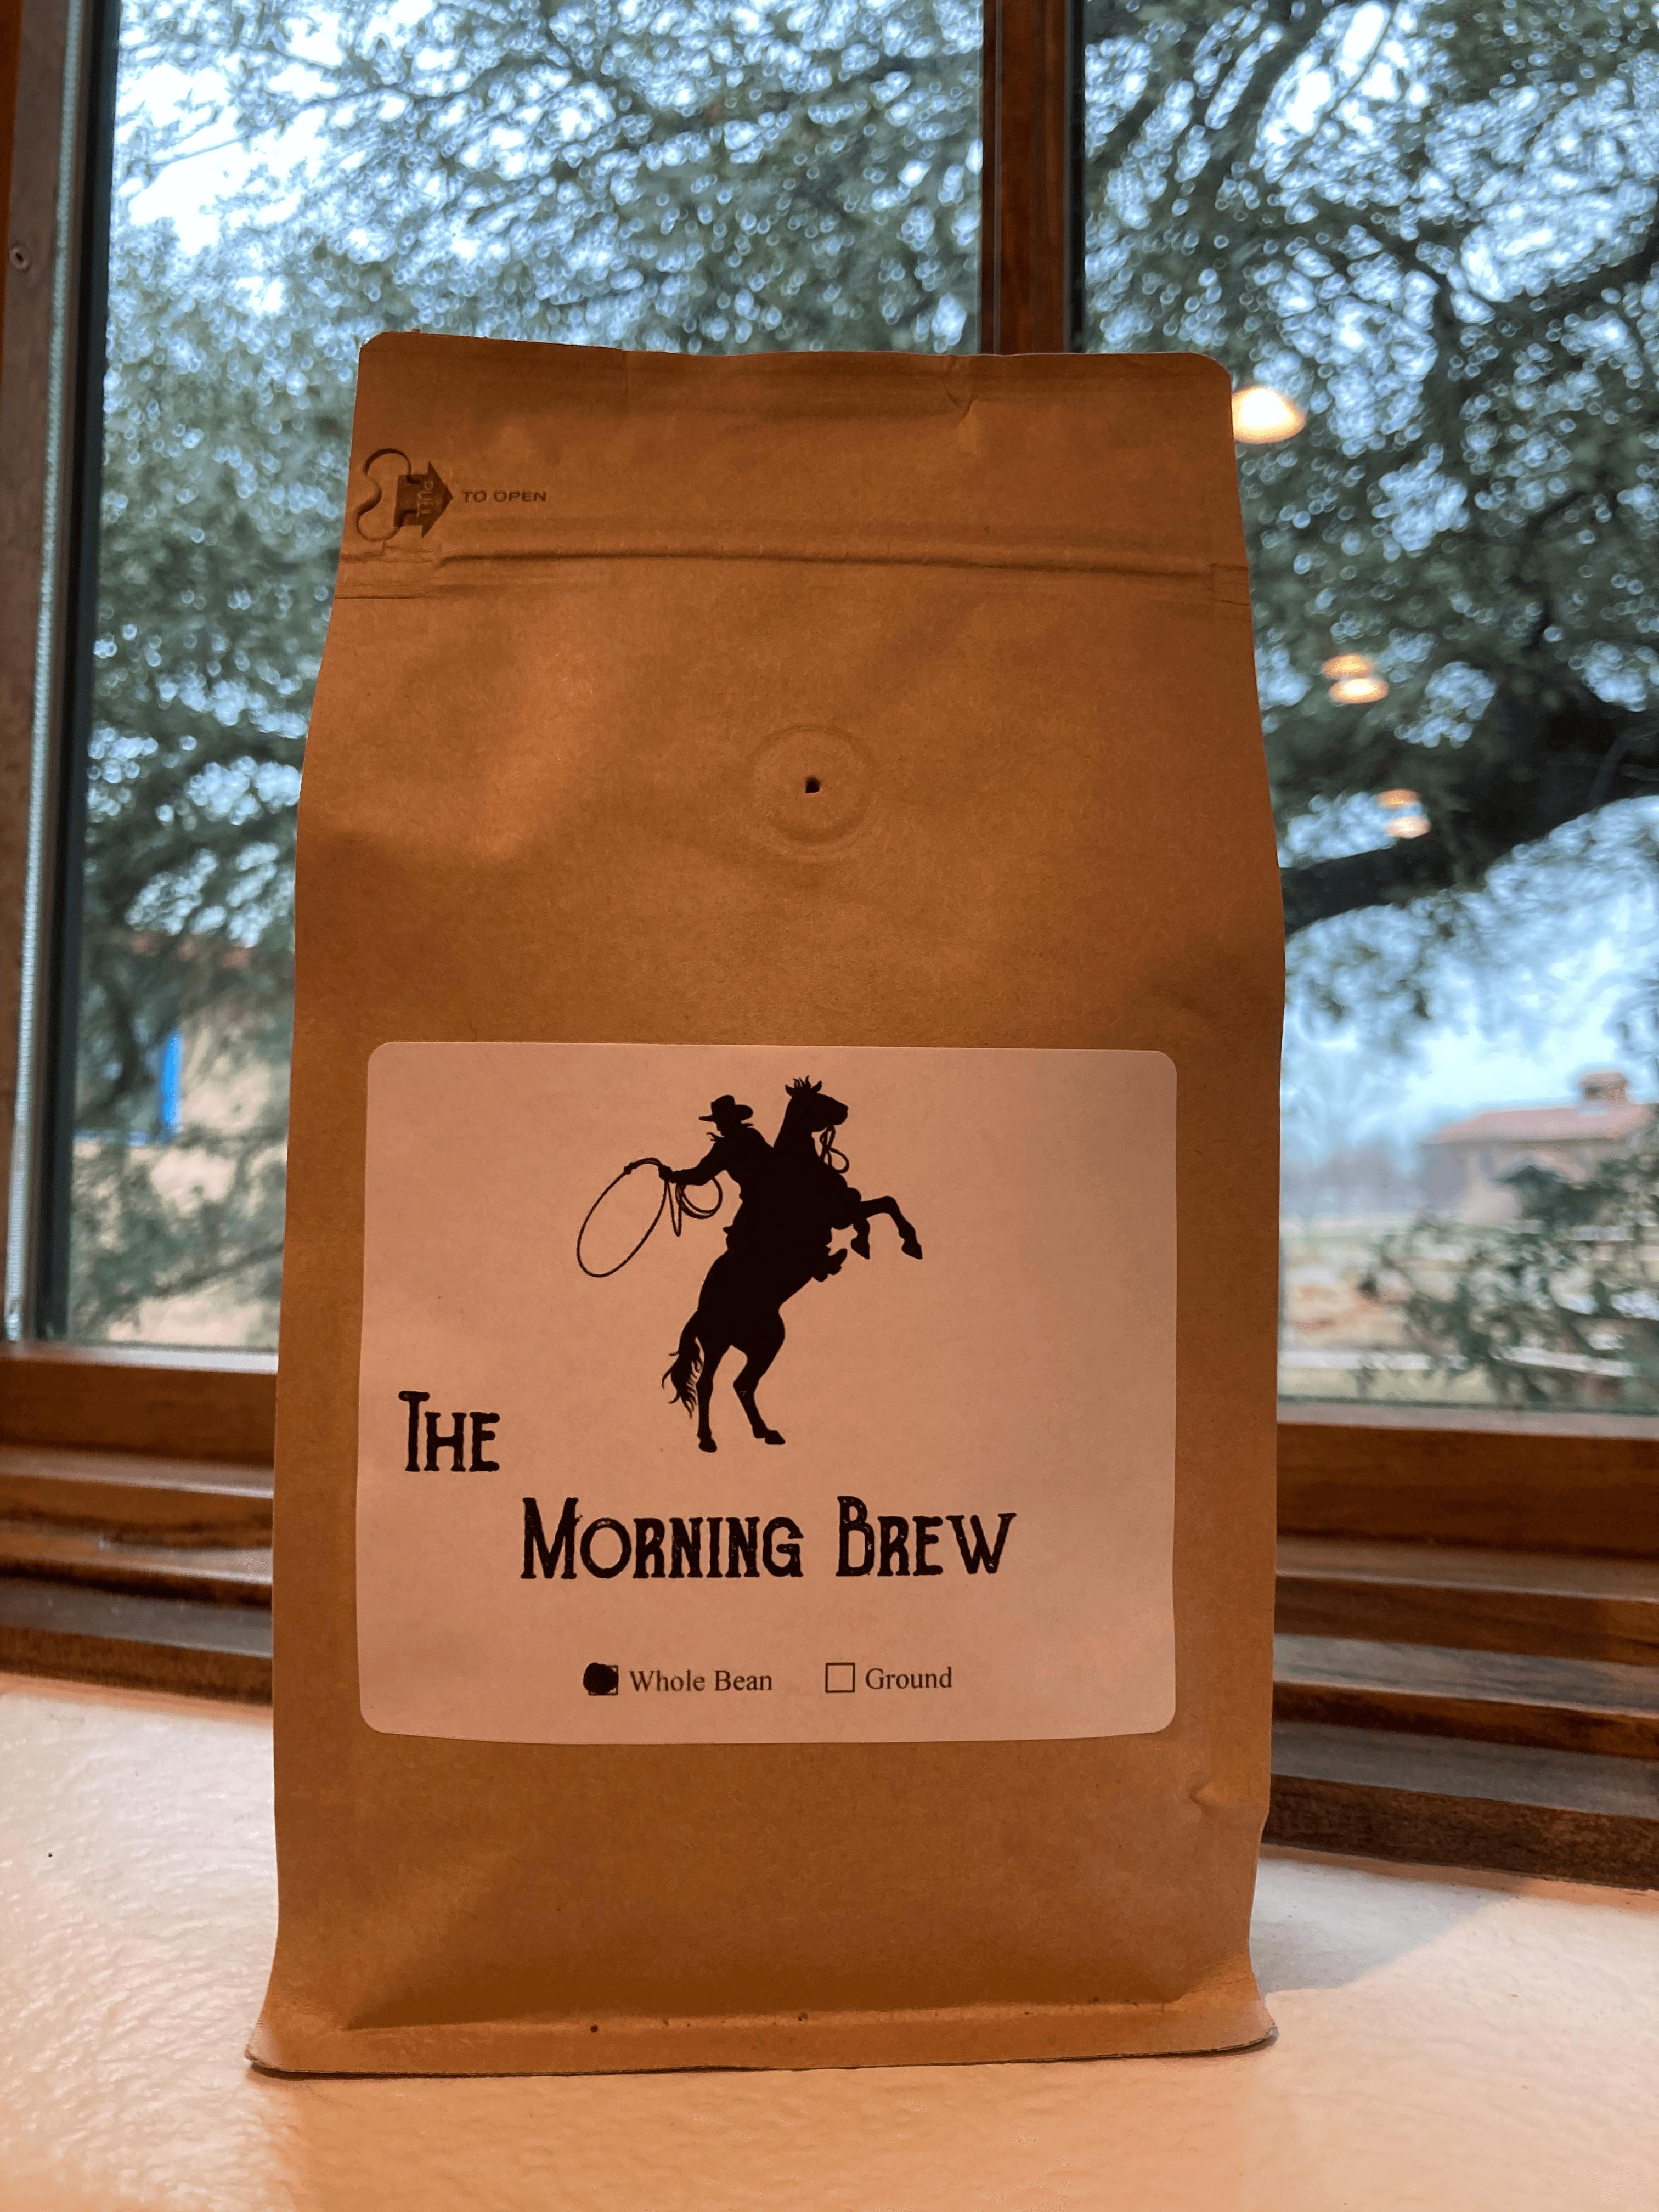 The Morning Brew from Hacienda Salida Del Sol